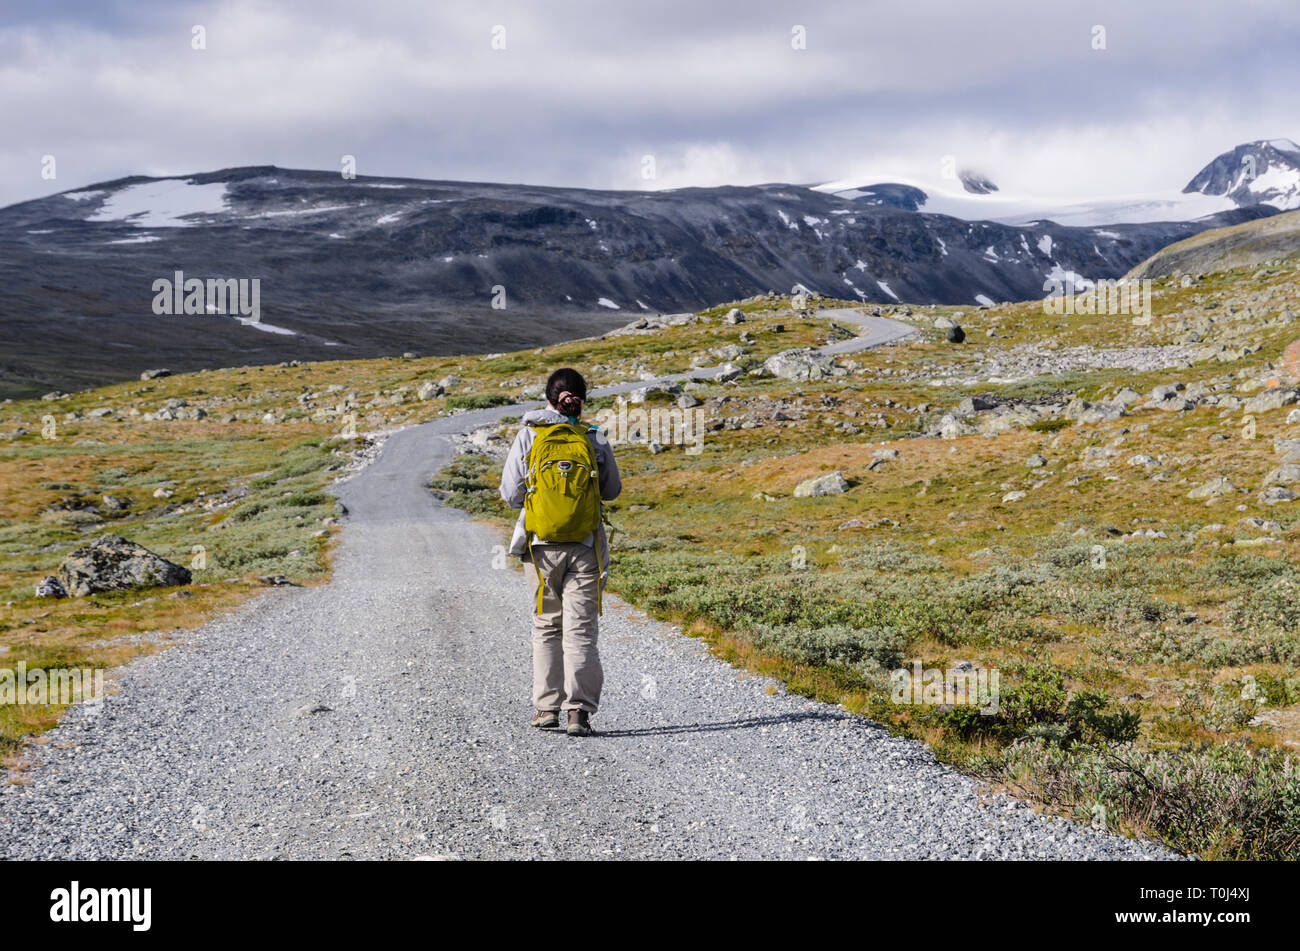 Tourist in the Jotunheimen national park - Stock Image